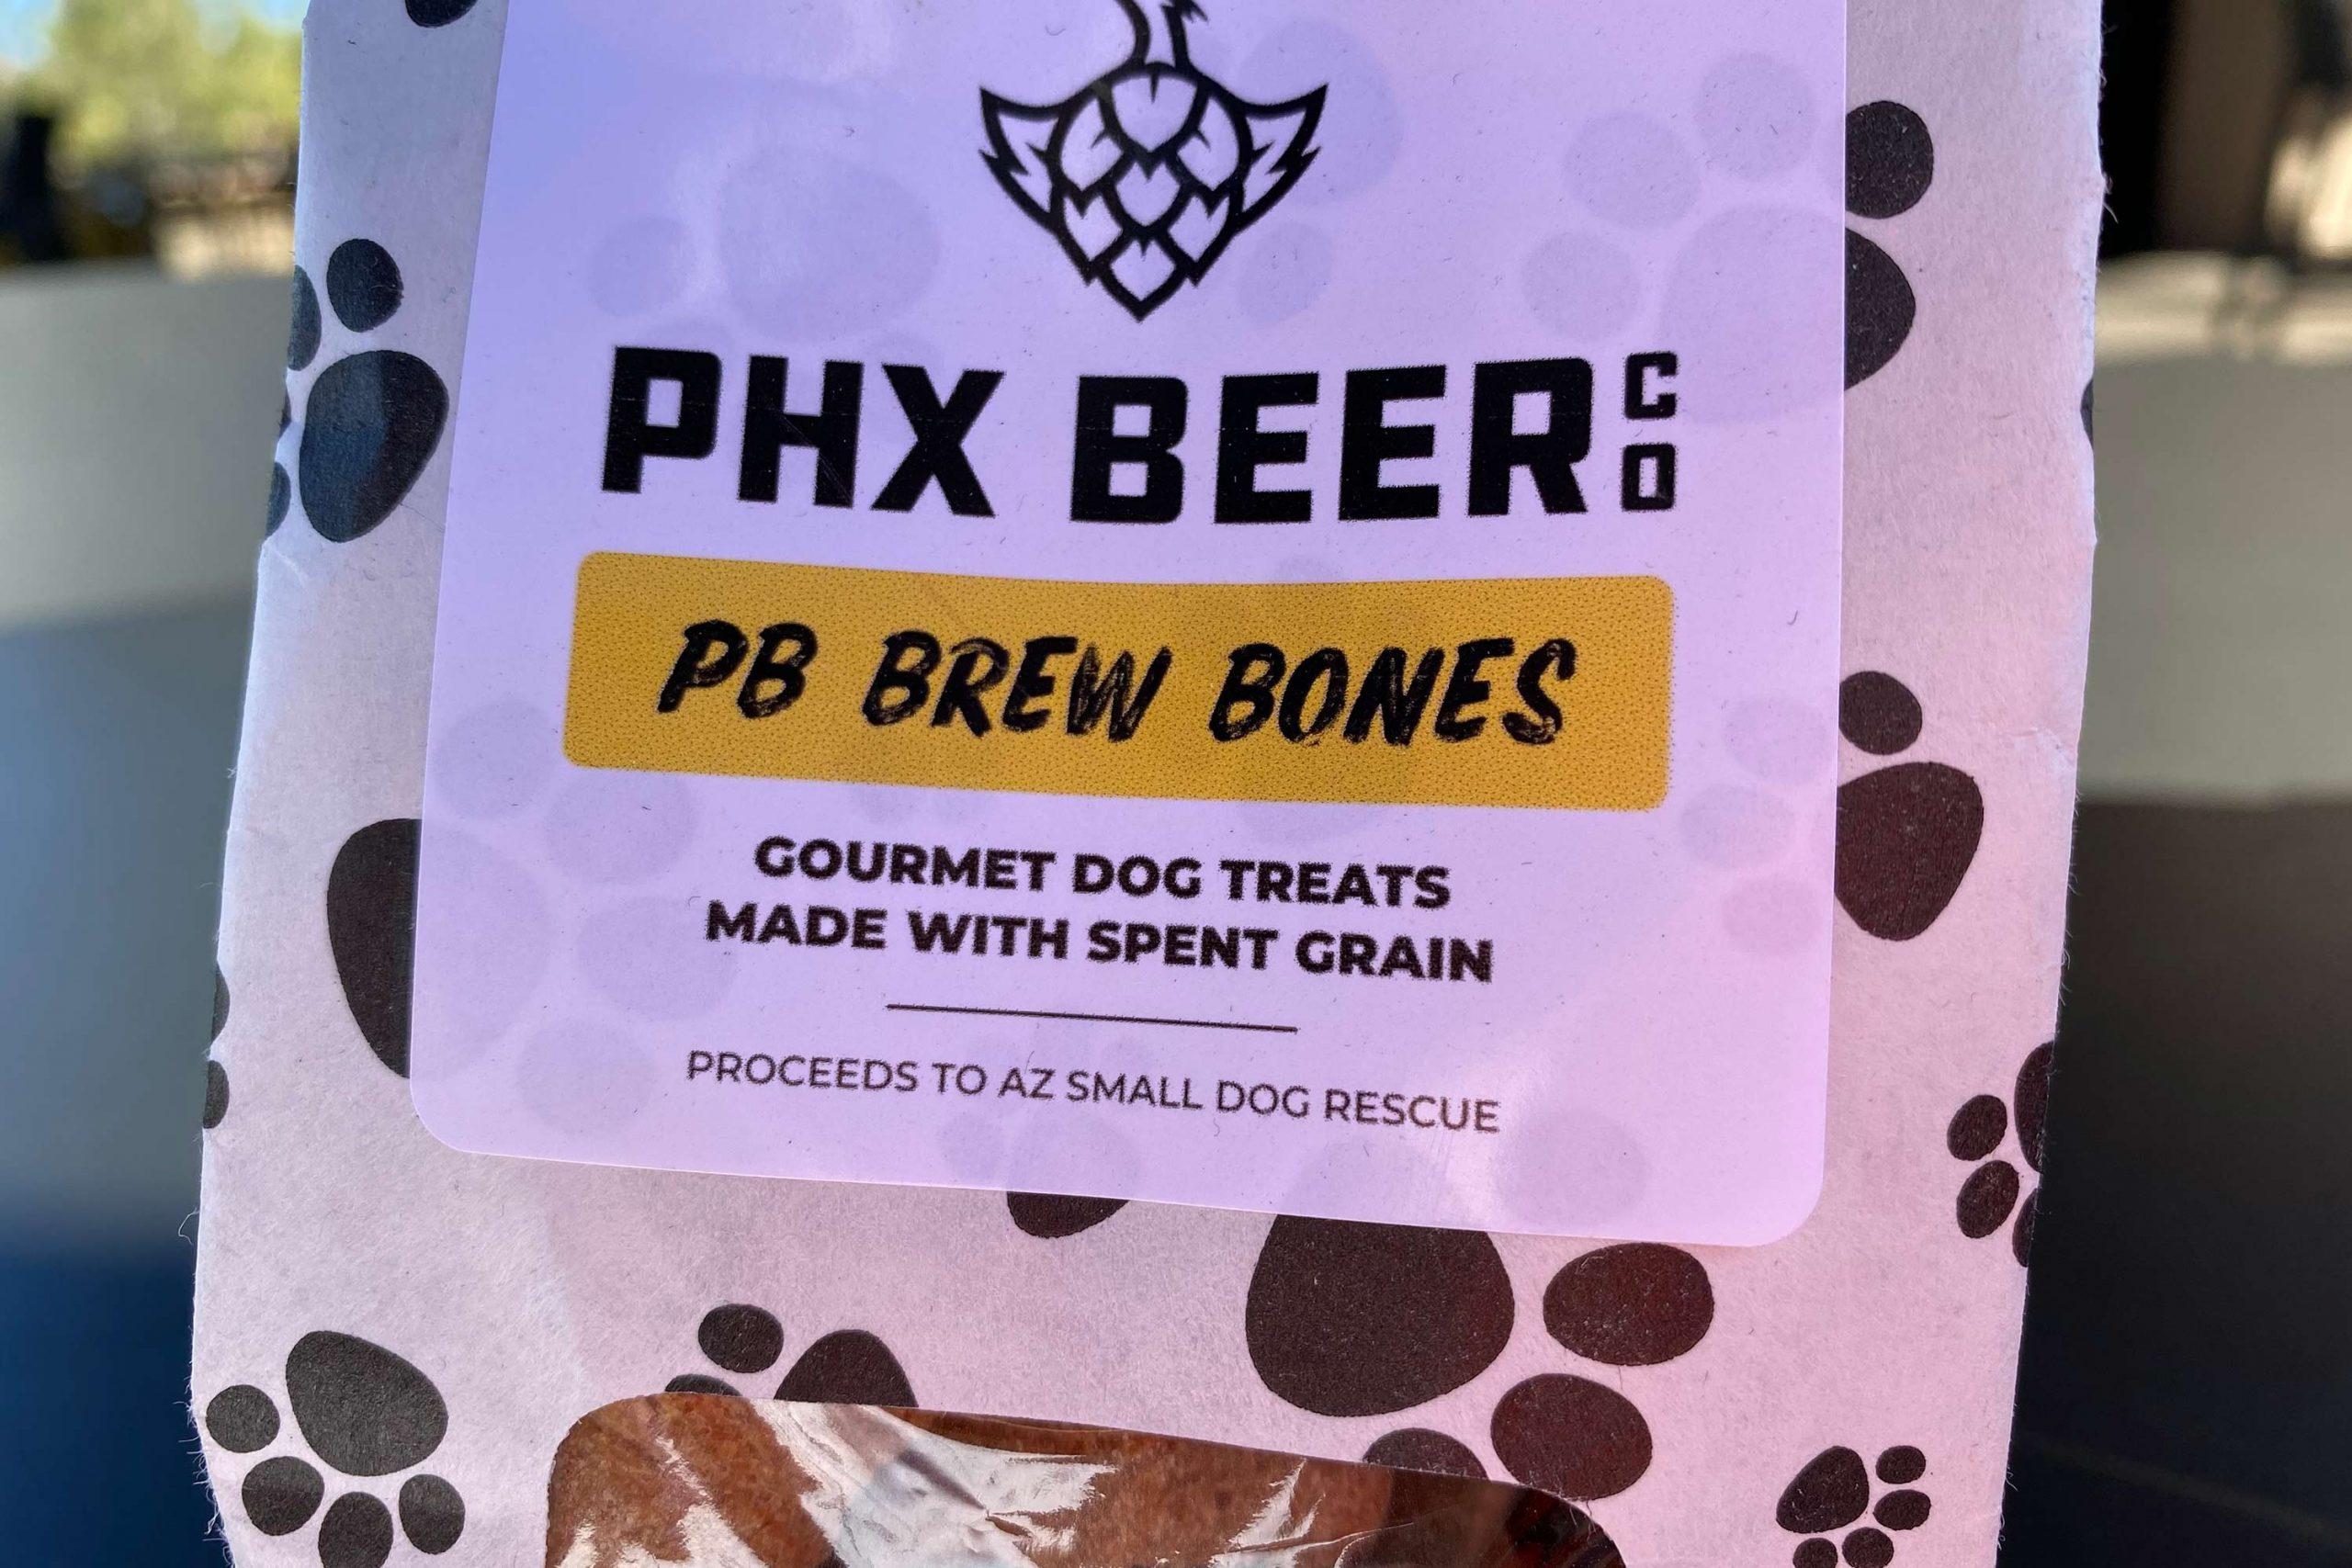 PB Brew Bones made with spent grain.